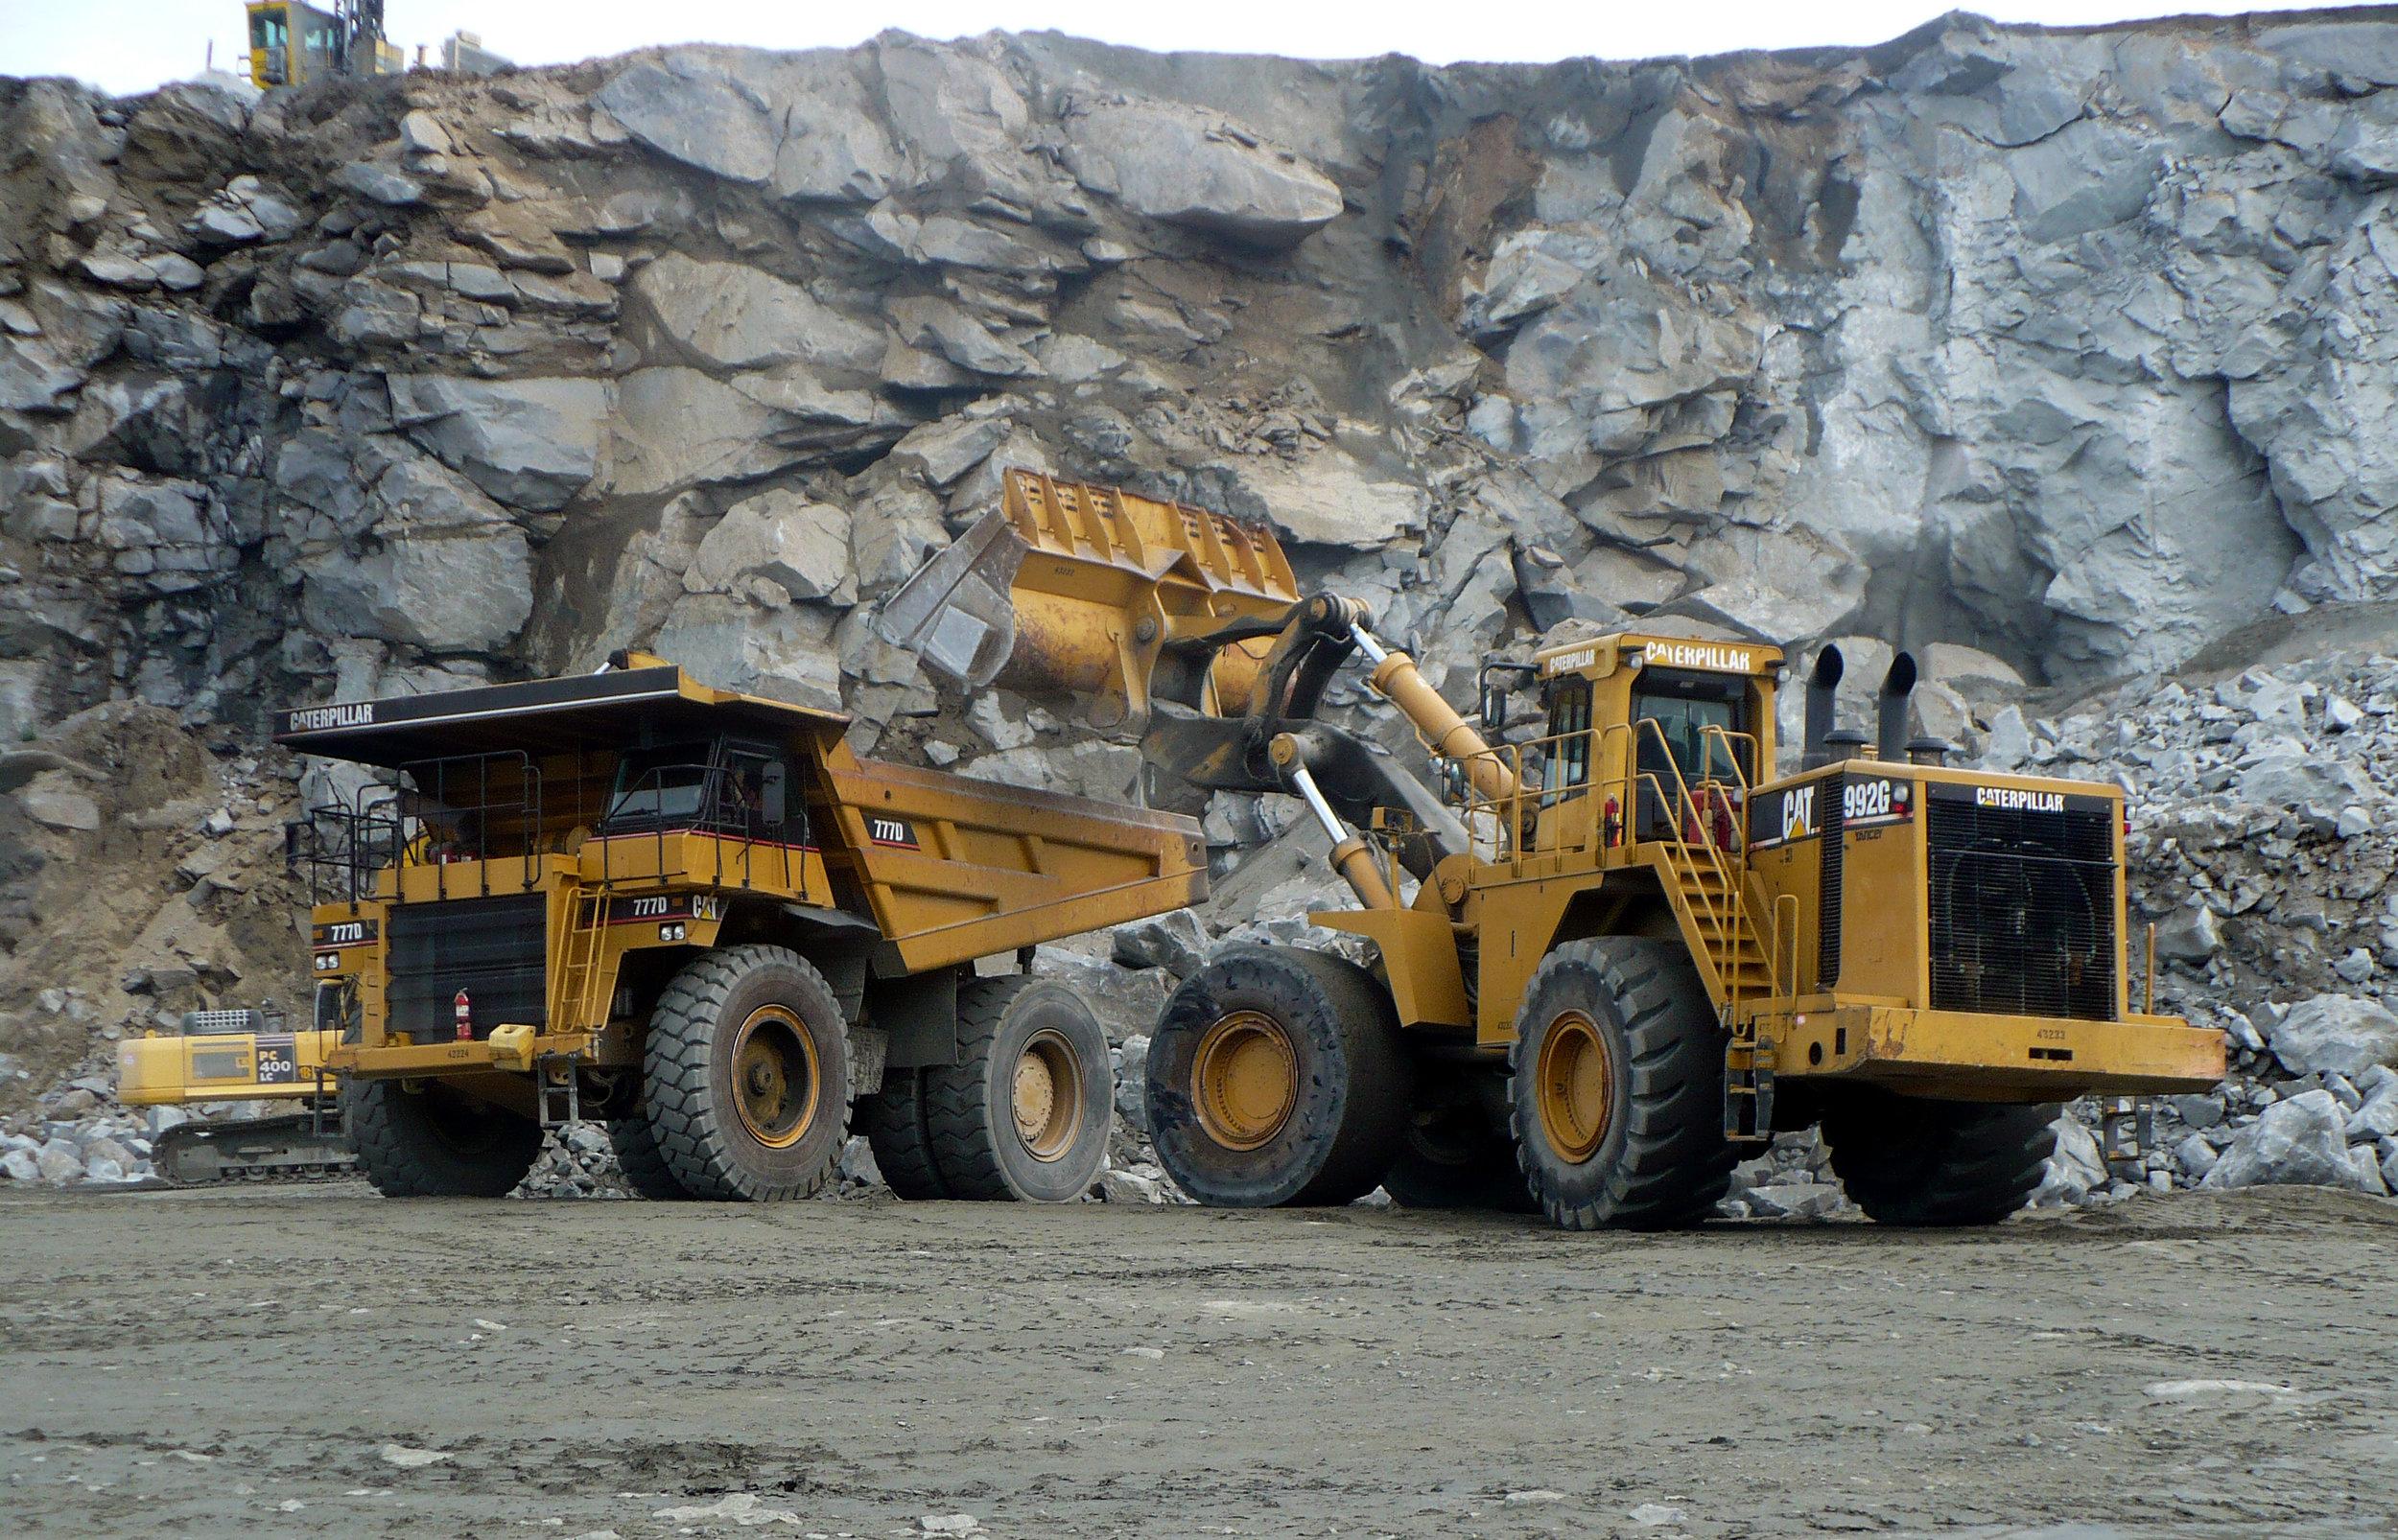 A Mining Development and Exploration Company